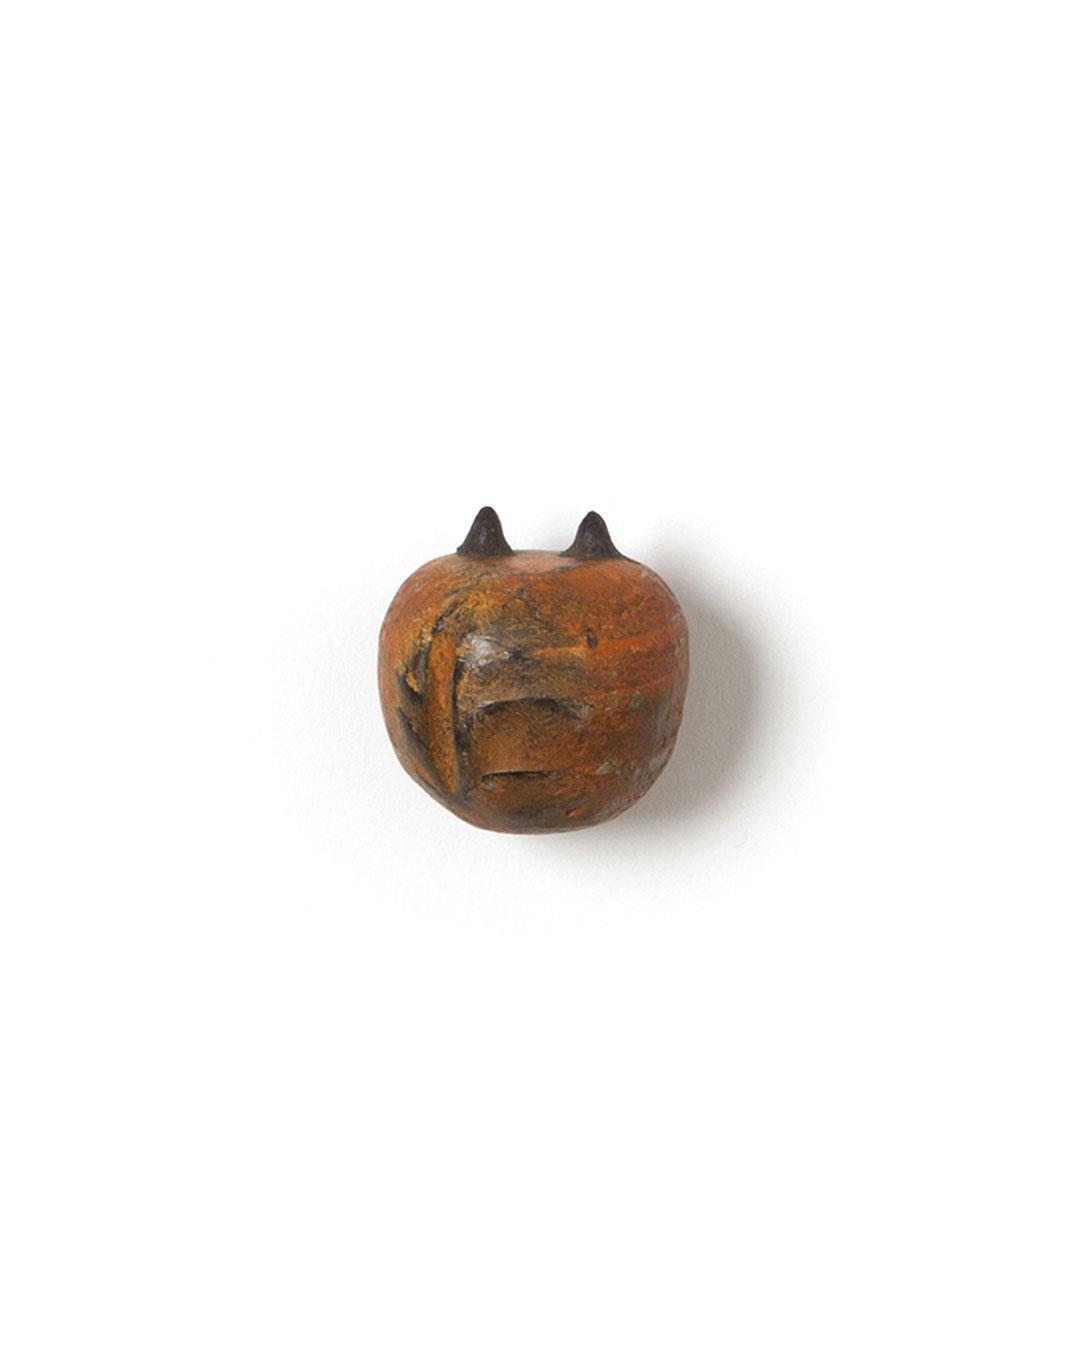 Mari Iwamoto, Weak Monster, 2015, brooch; wood, silver, earth, acrylic paint, 20 x 23 x 20 mm (small), €150